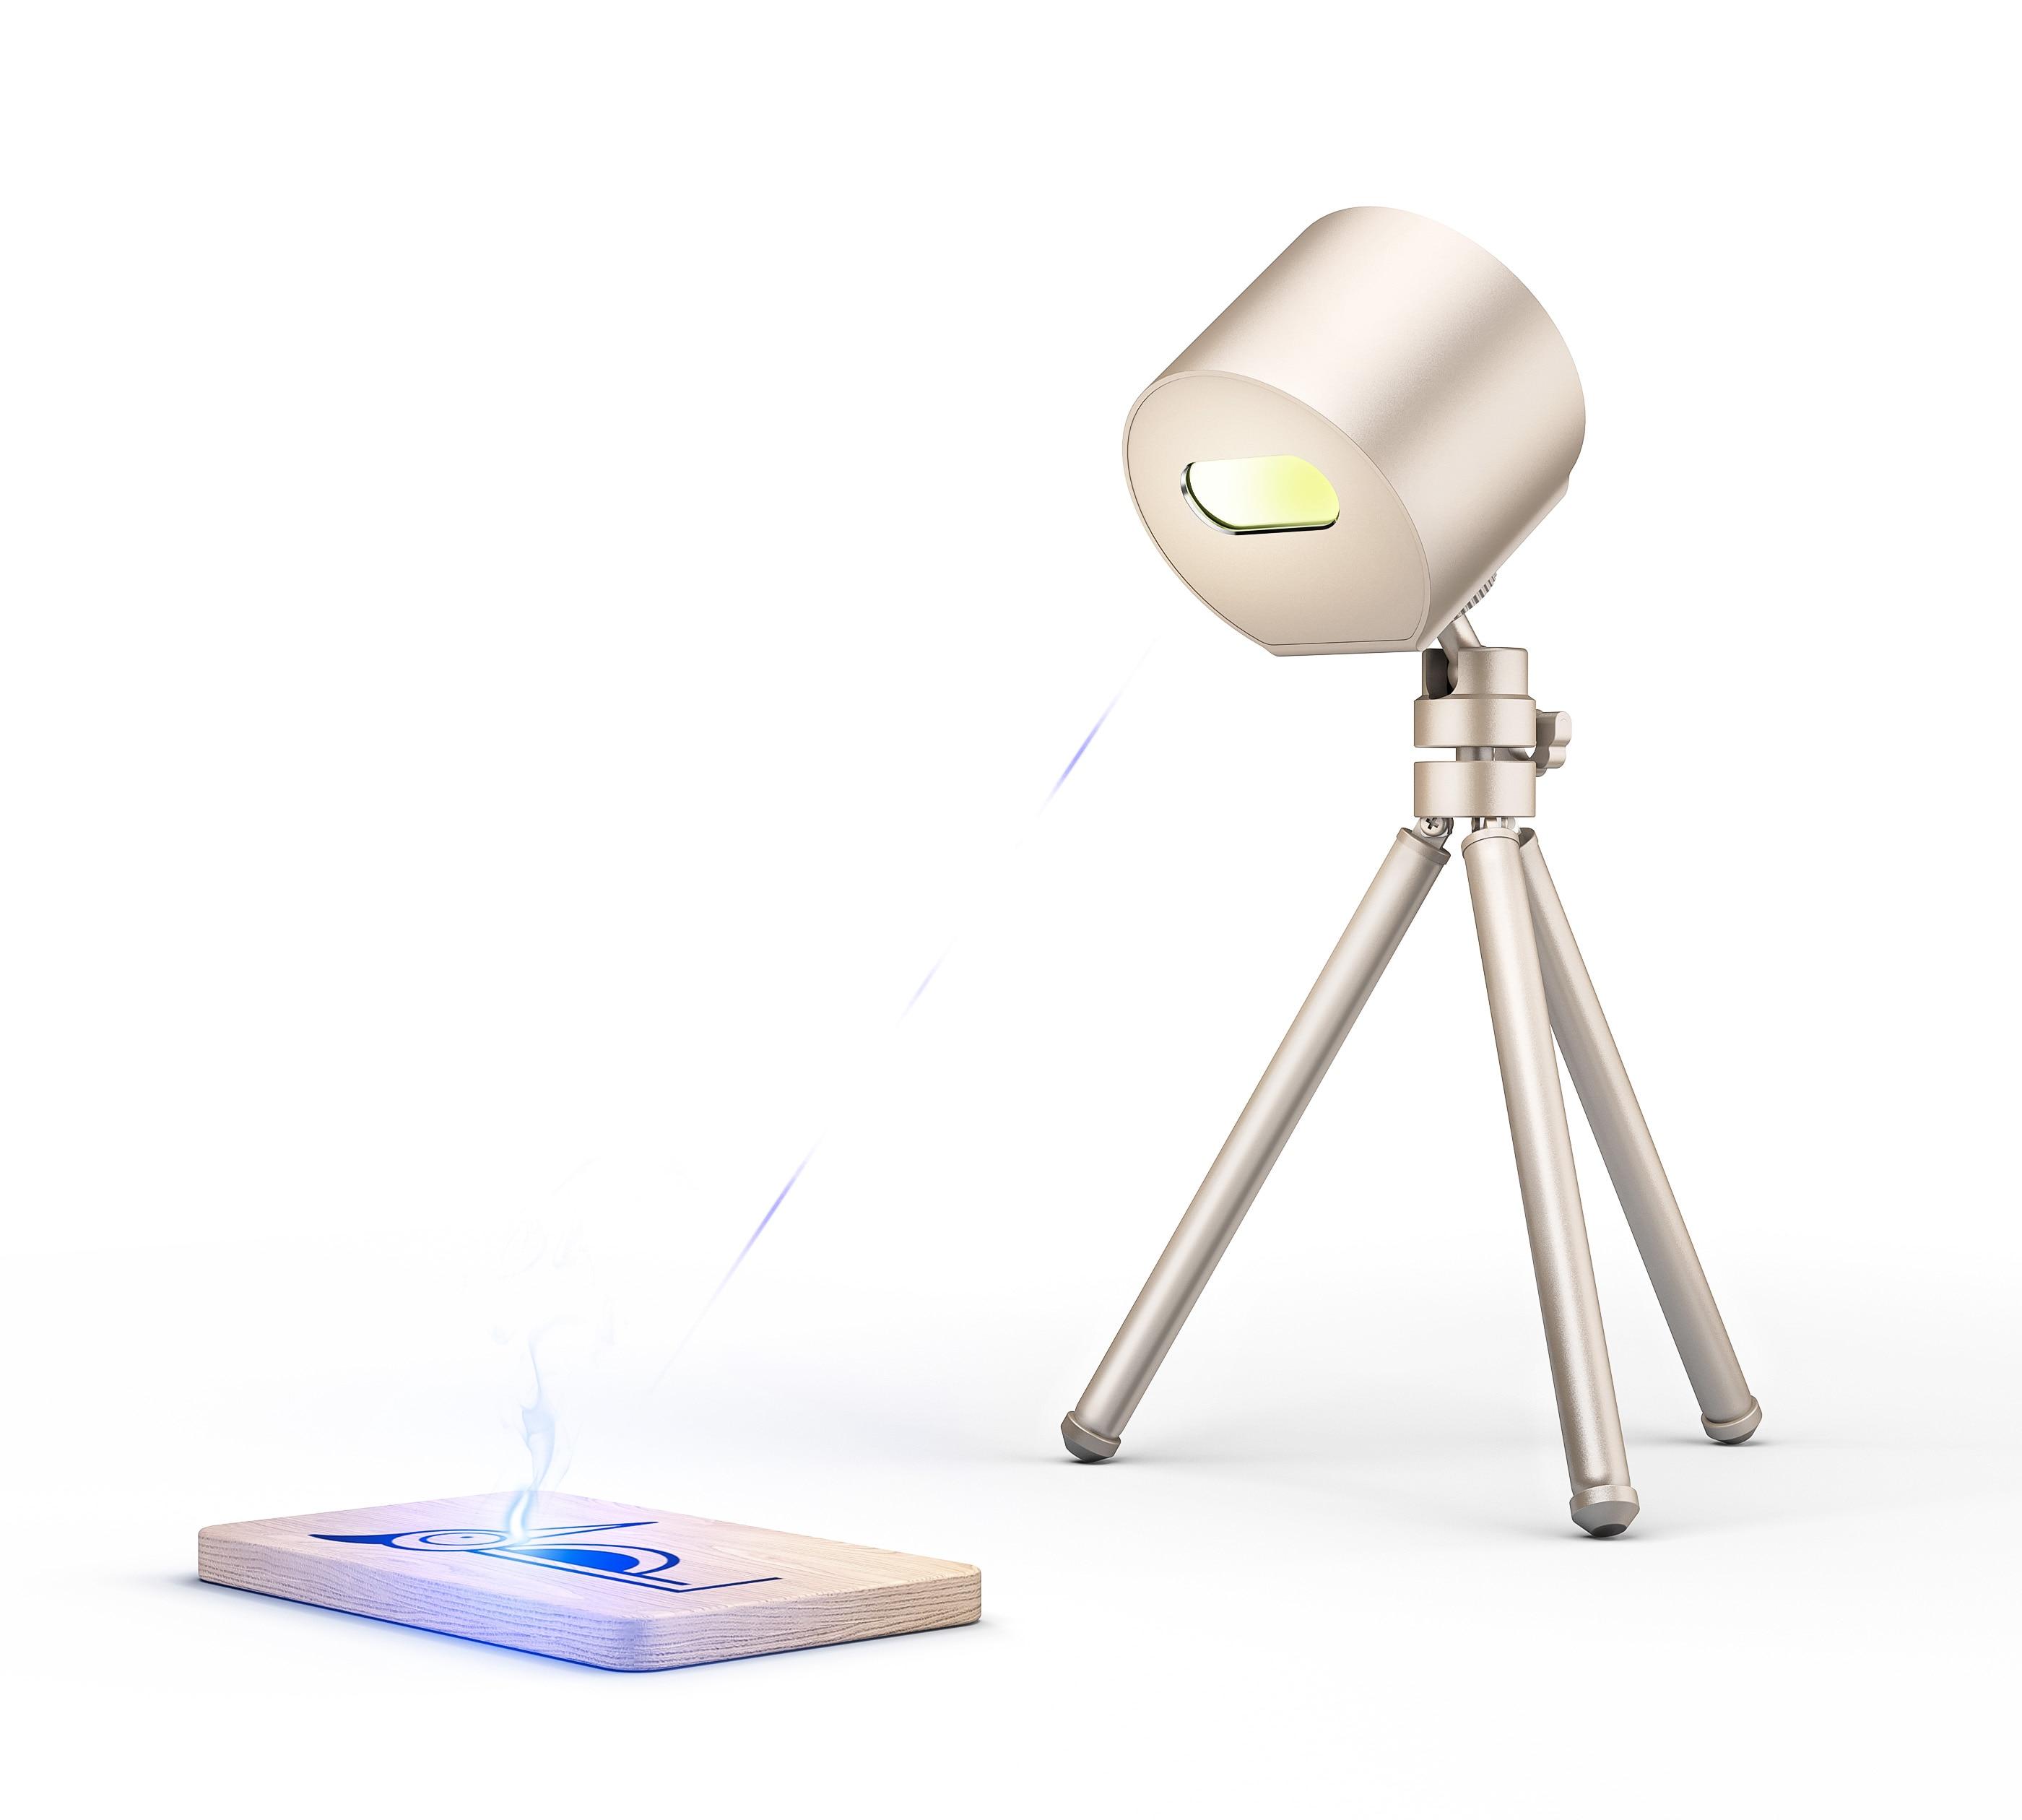 1.6 w compacto máquina de gravador a laser portátil pecker laser mini desktop gravura a laser etcher cortador a laser impressora segurança